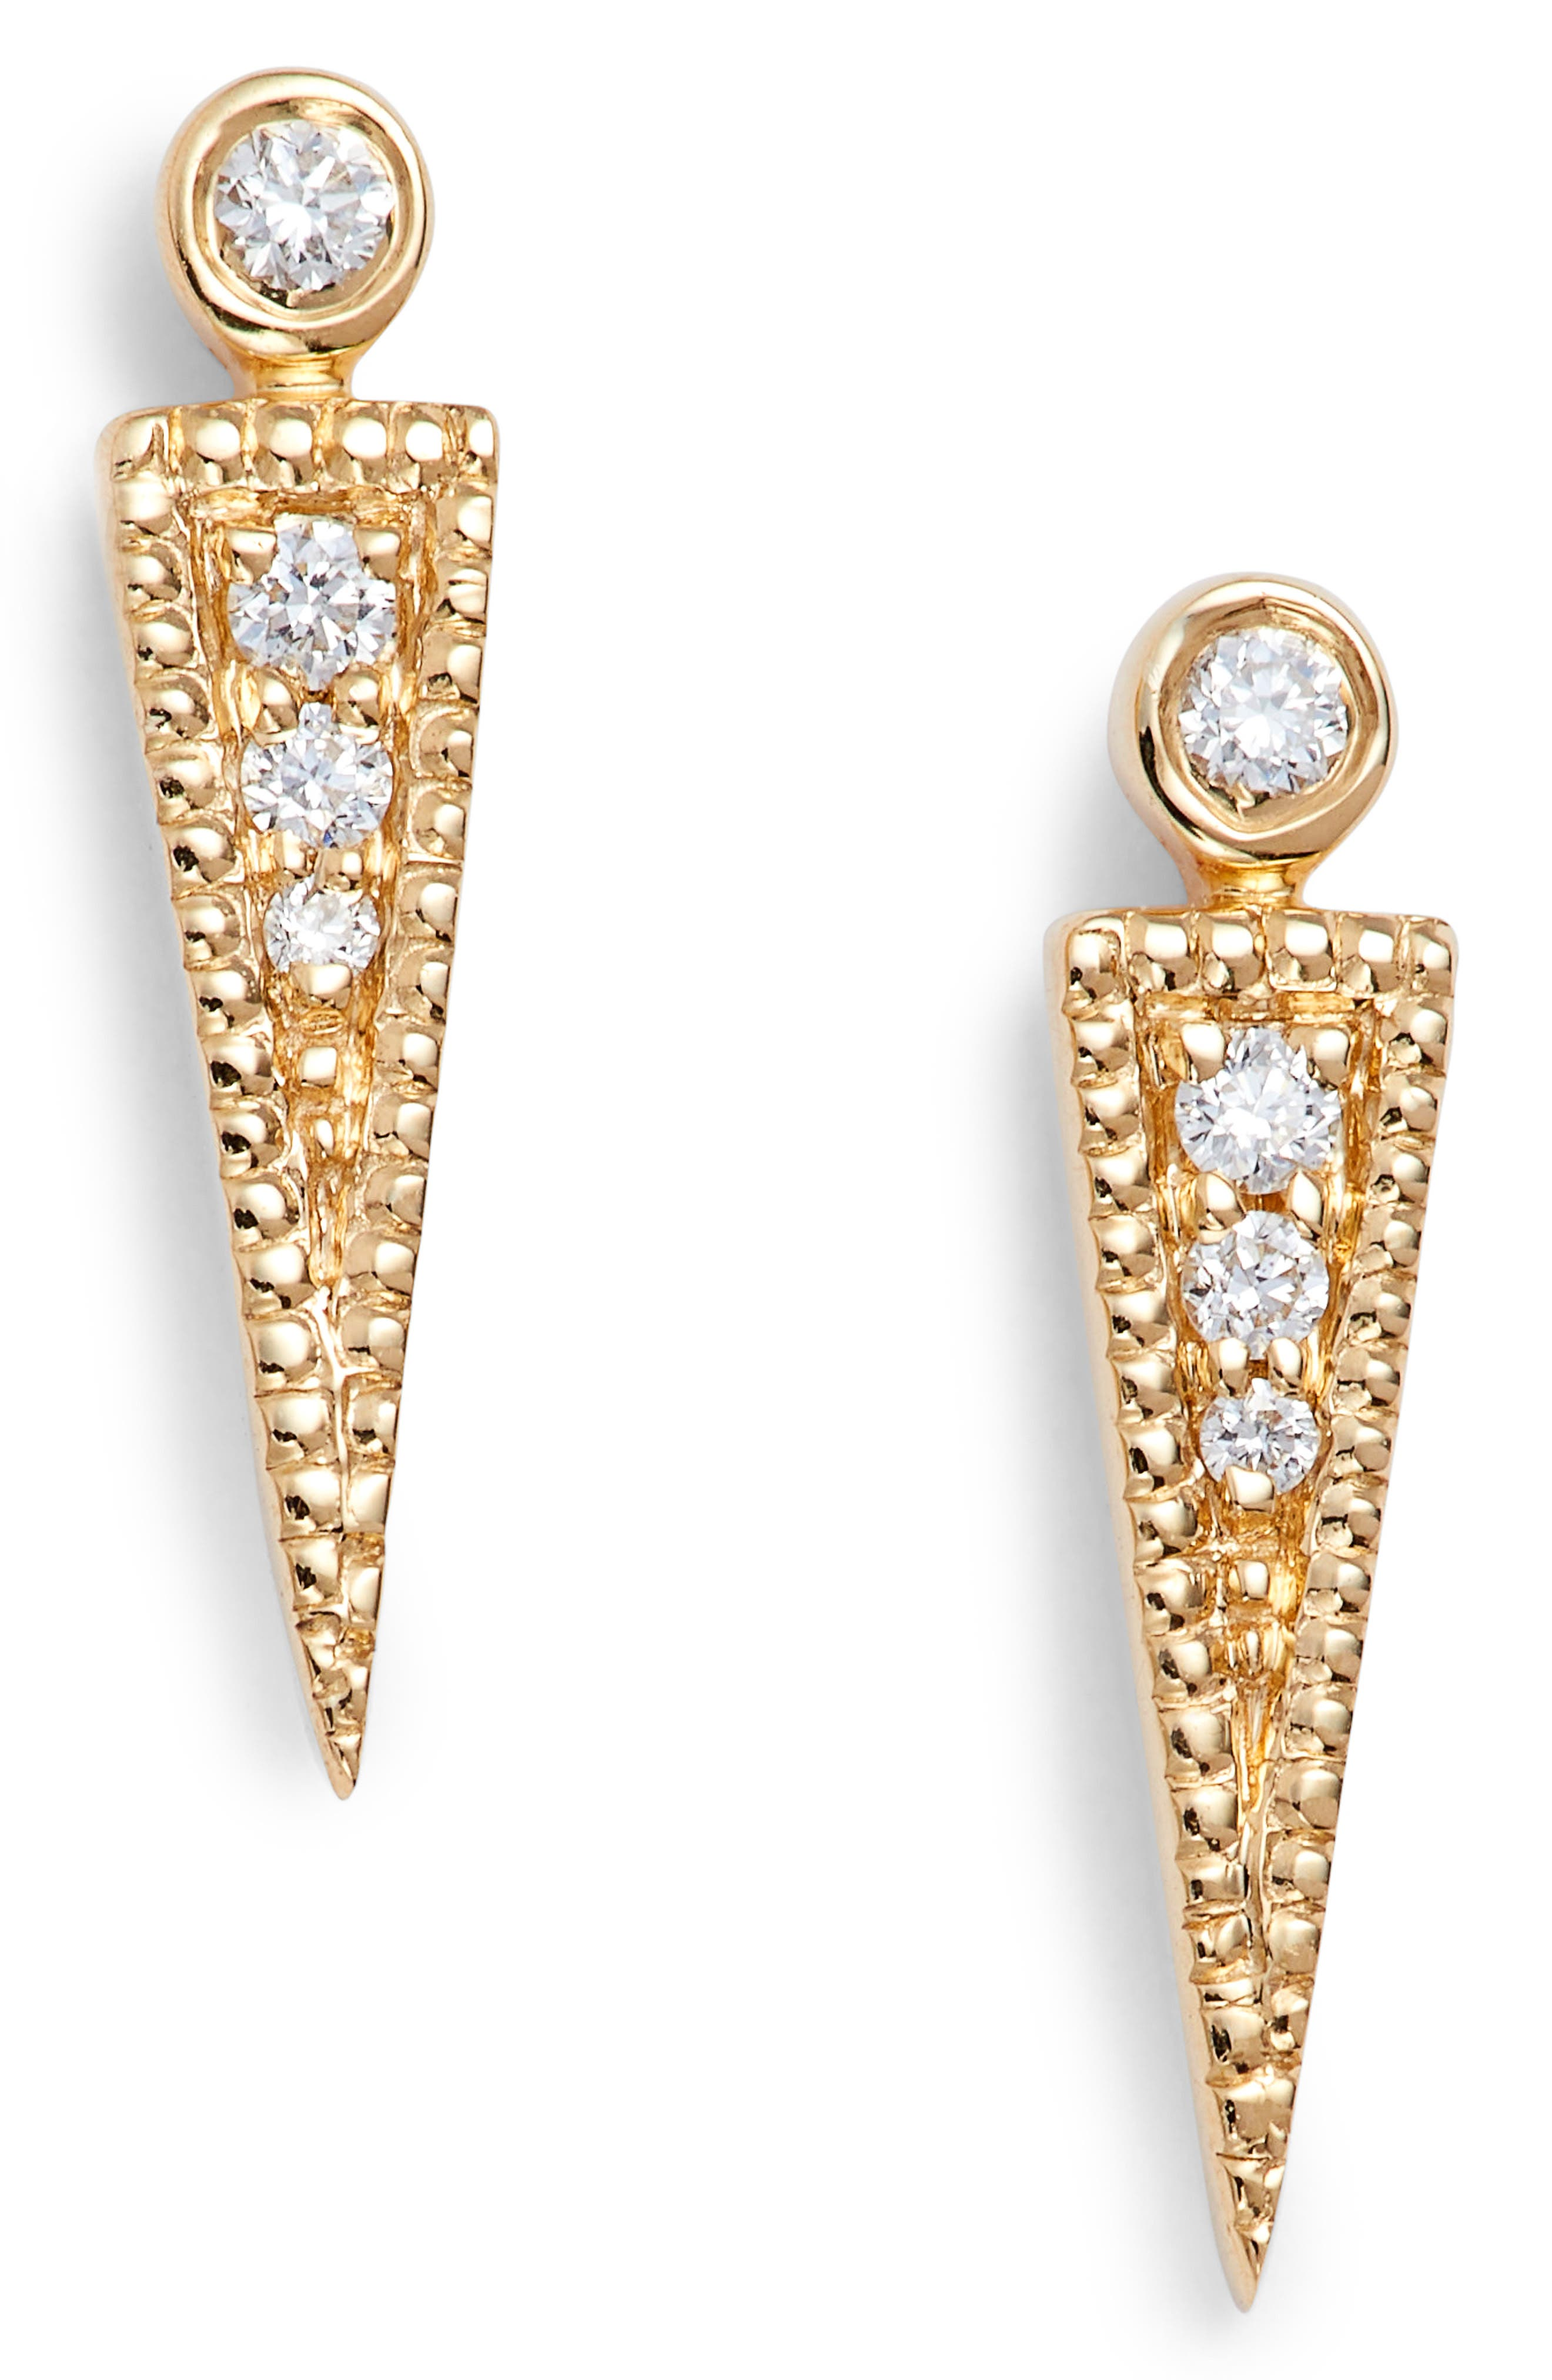 Dana Rebecca Samantha Lynn Diamond Dagger Earrings,                         Main,                         color, YELLOW GOLD